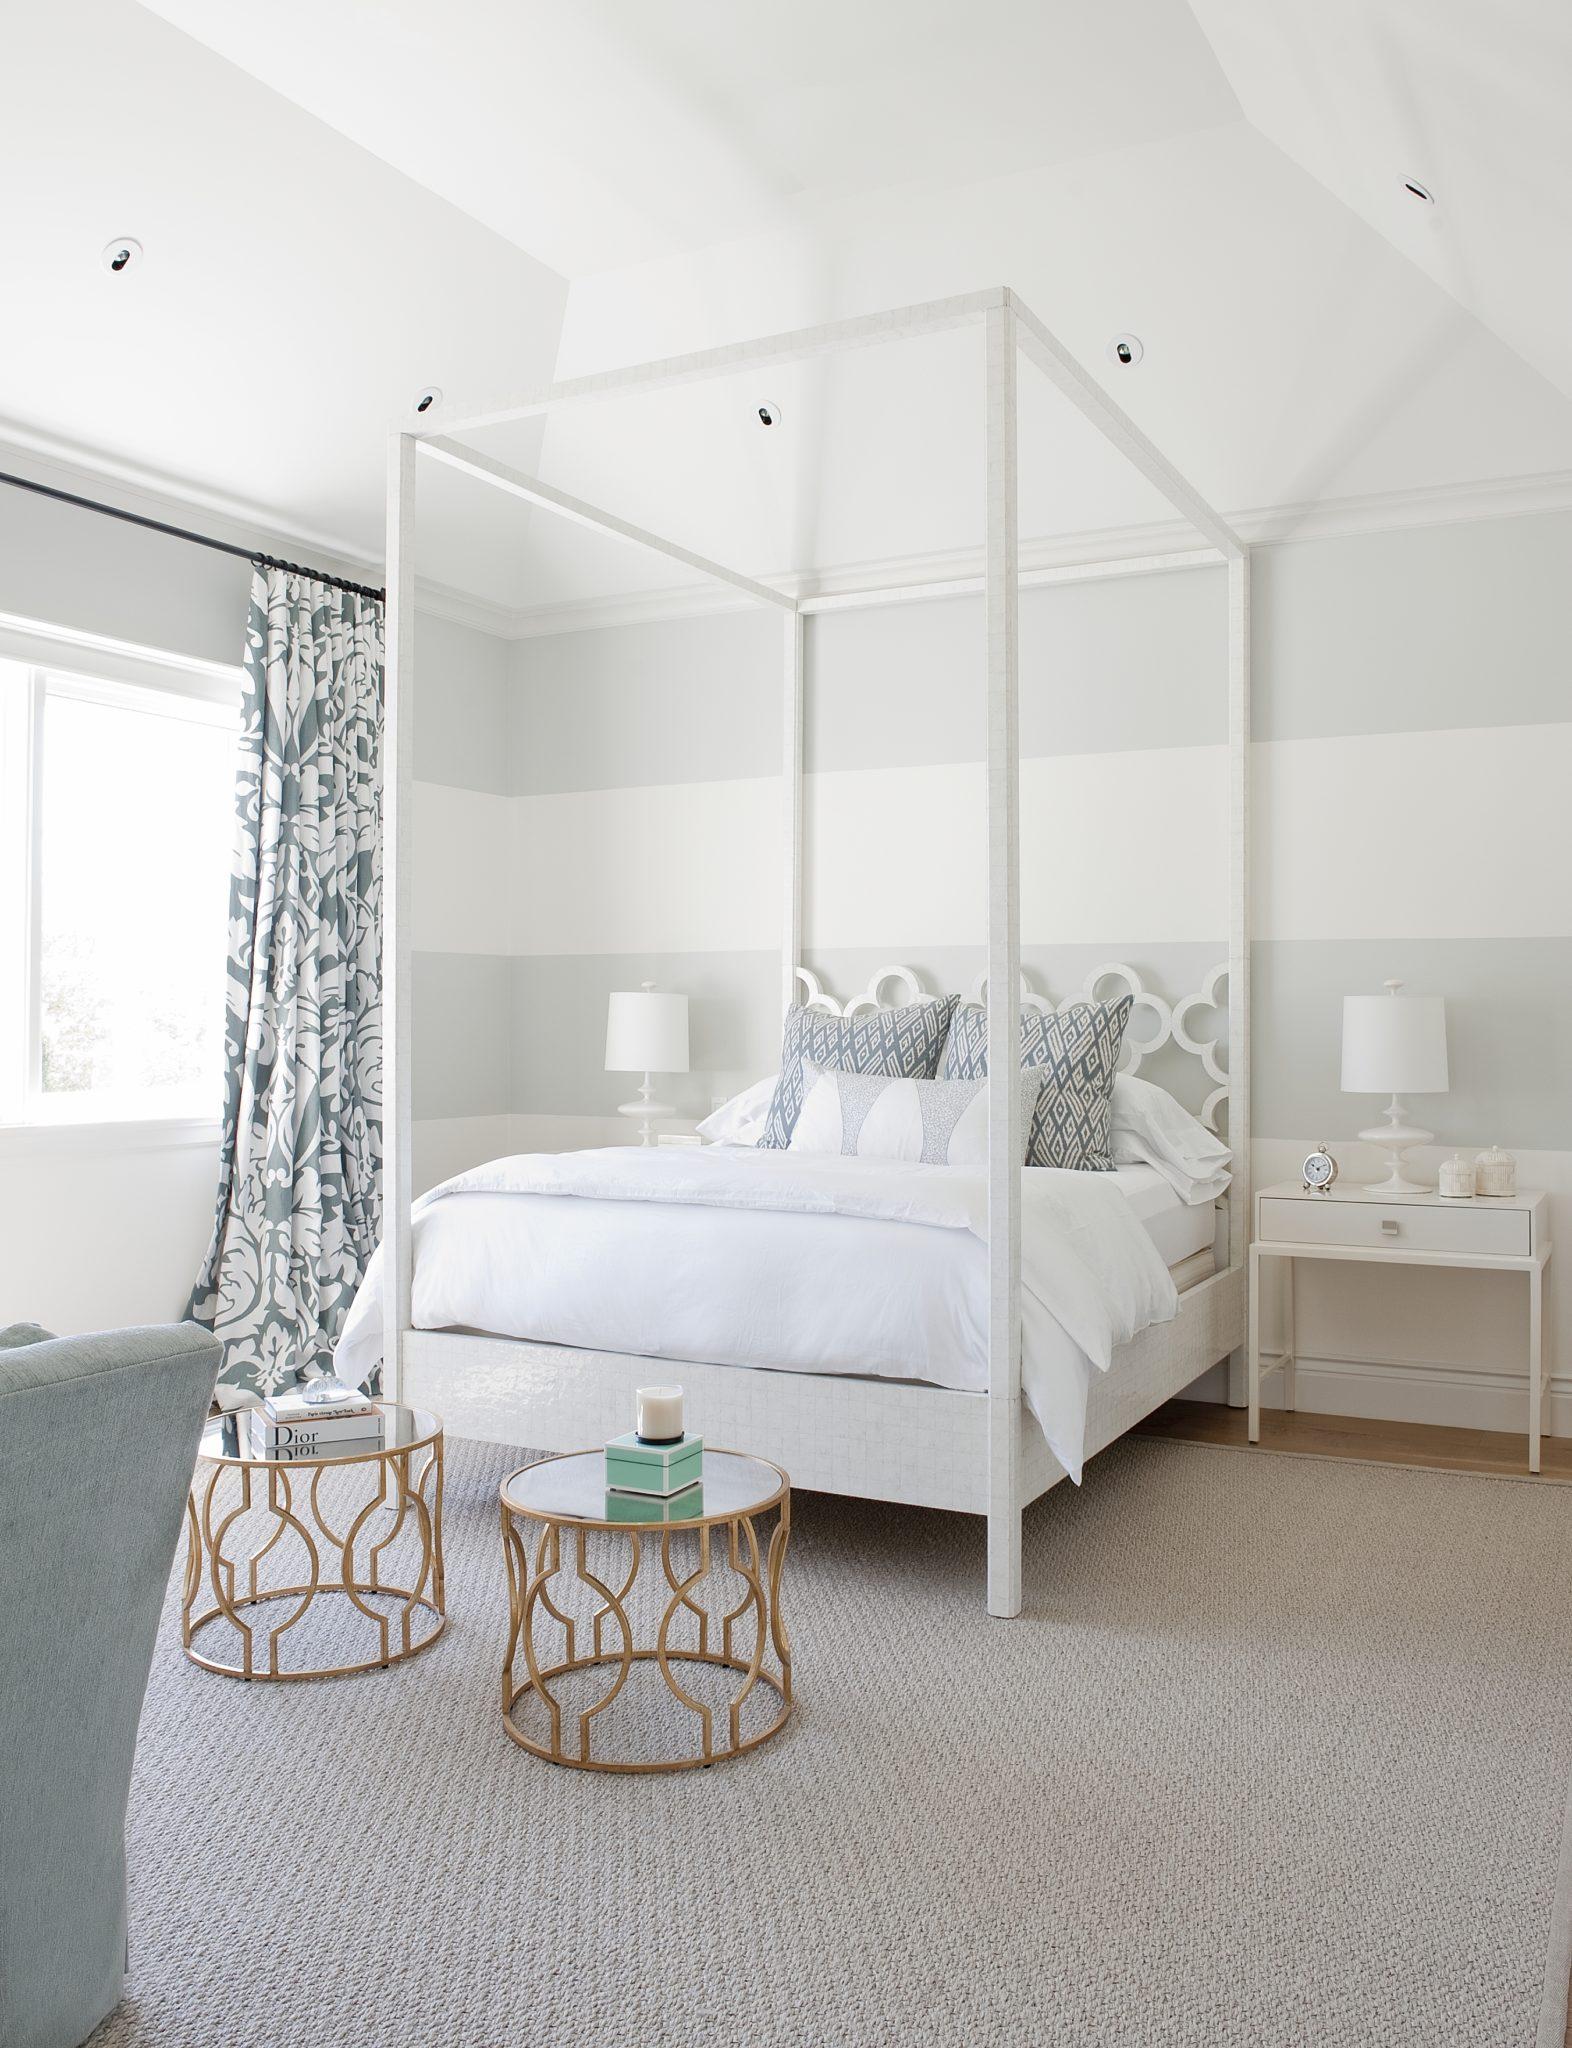 Interior design by MLK Studio